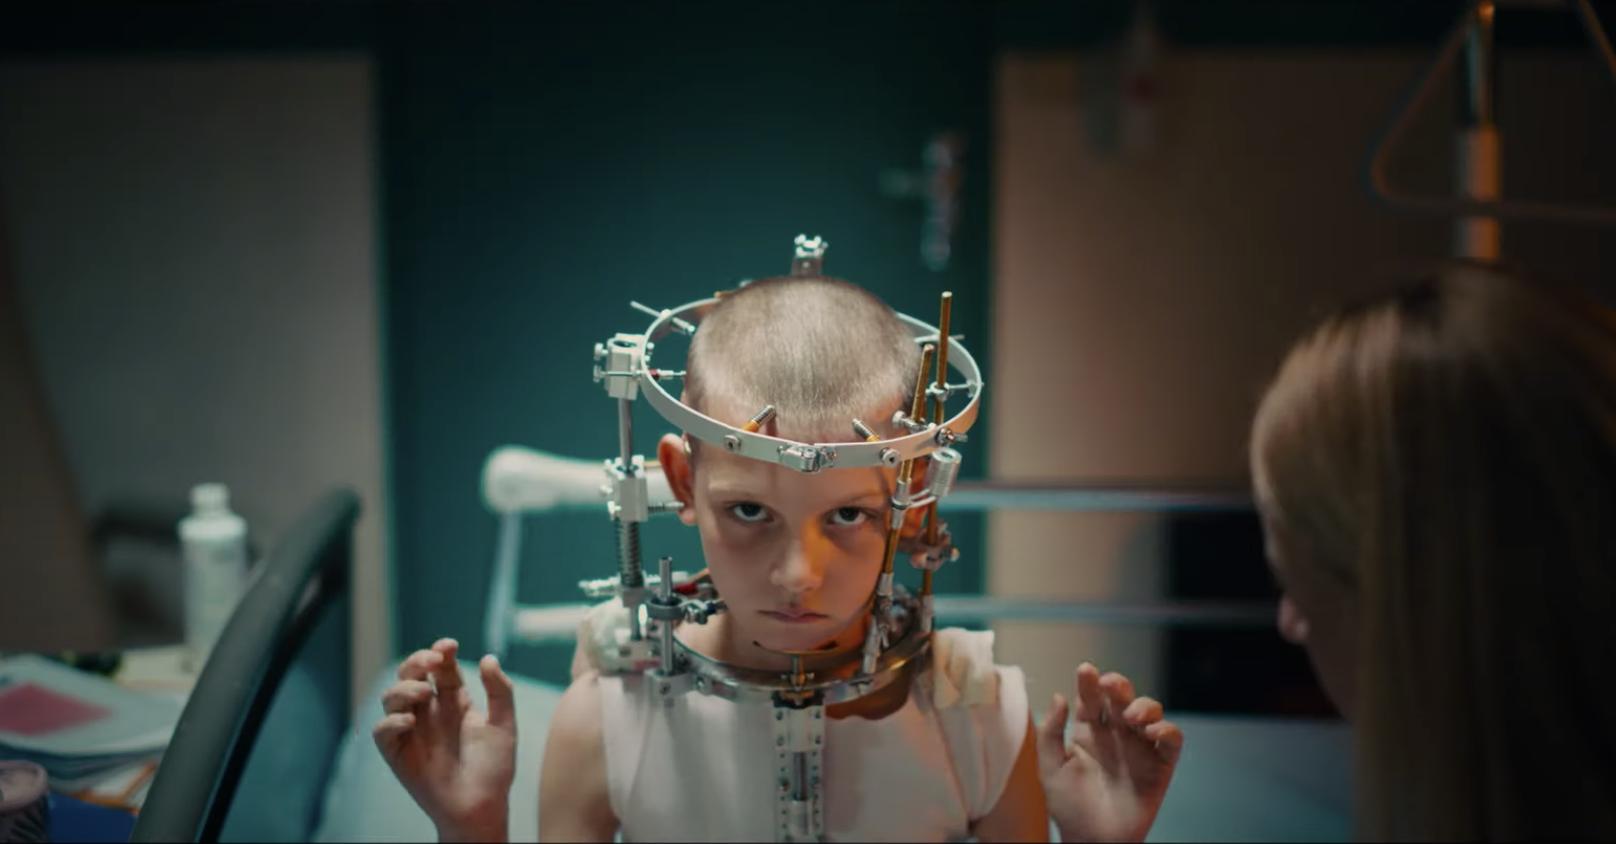 Titane' Trailer: Julia Ducournau Returns After Raw | IndieWire